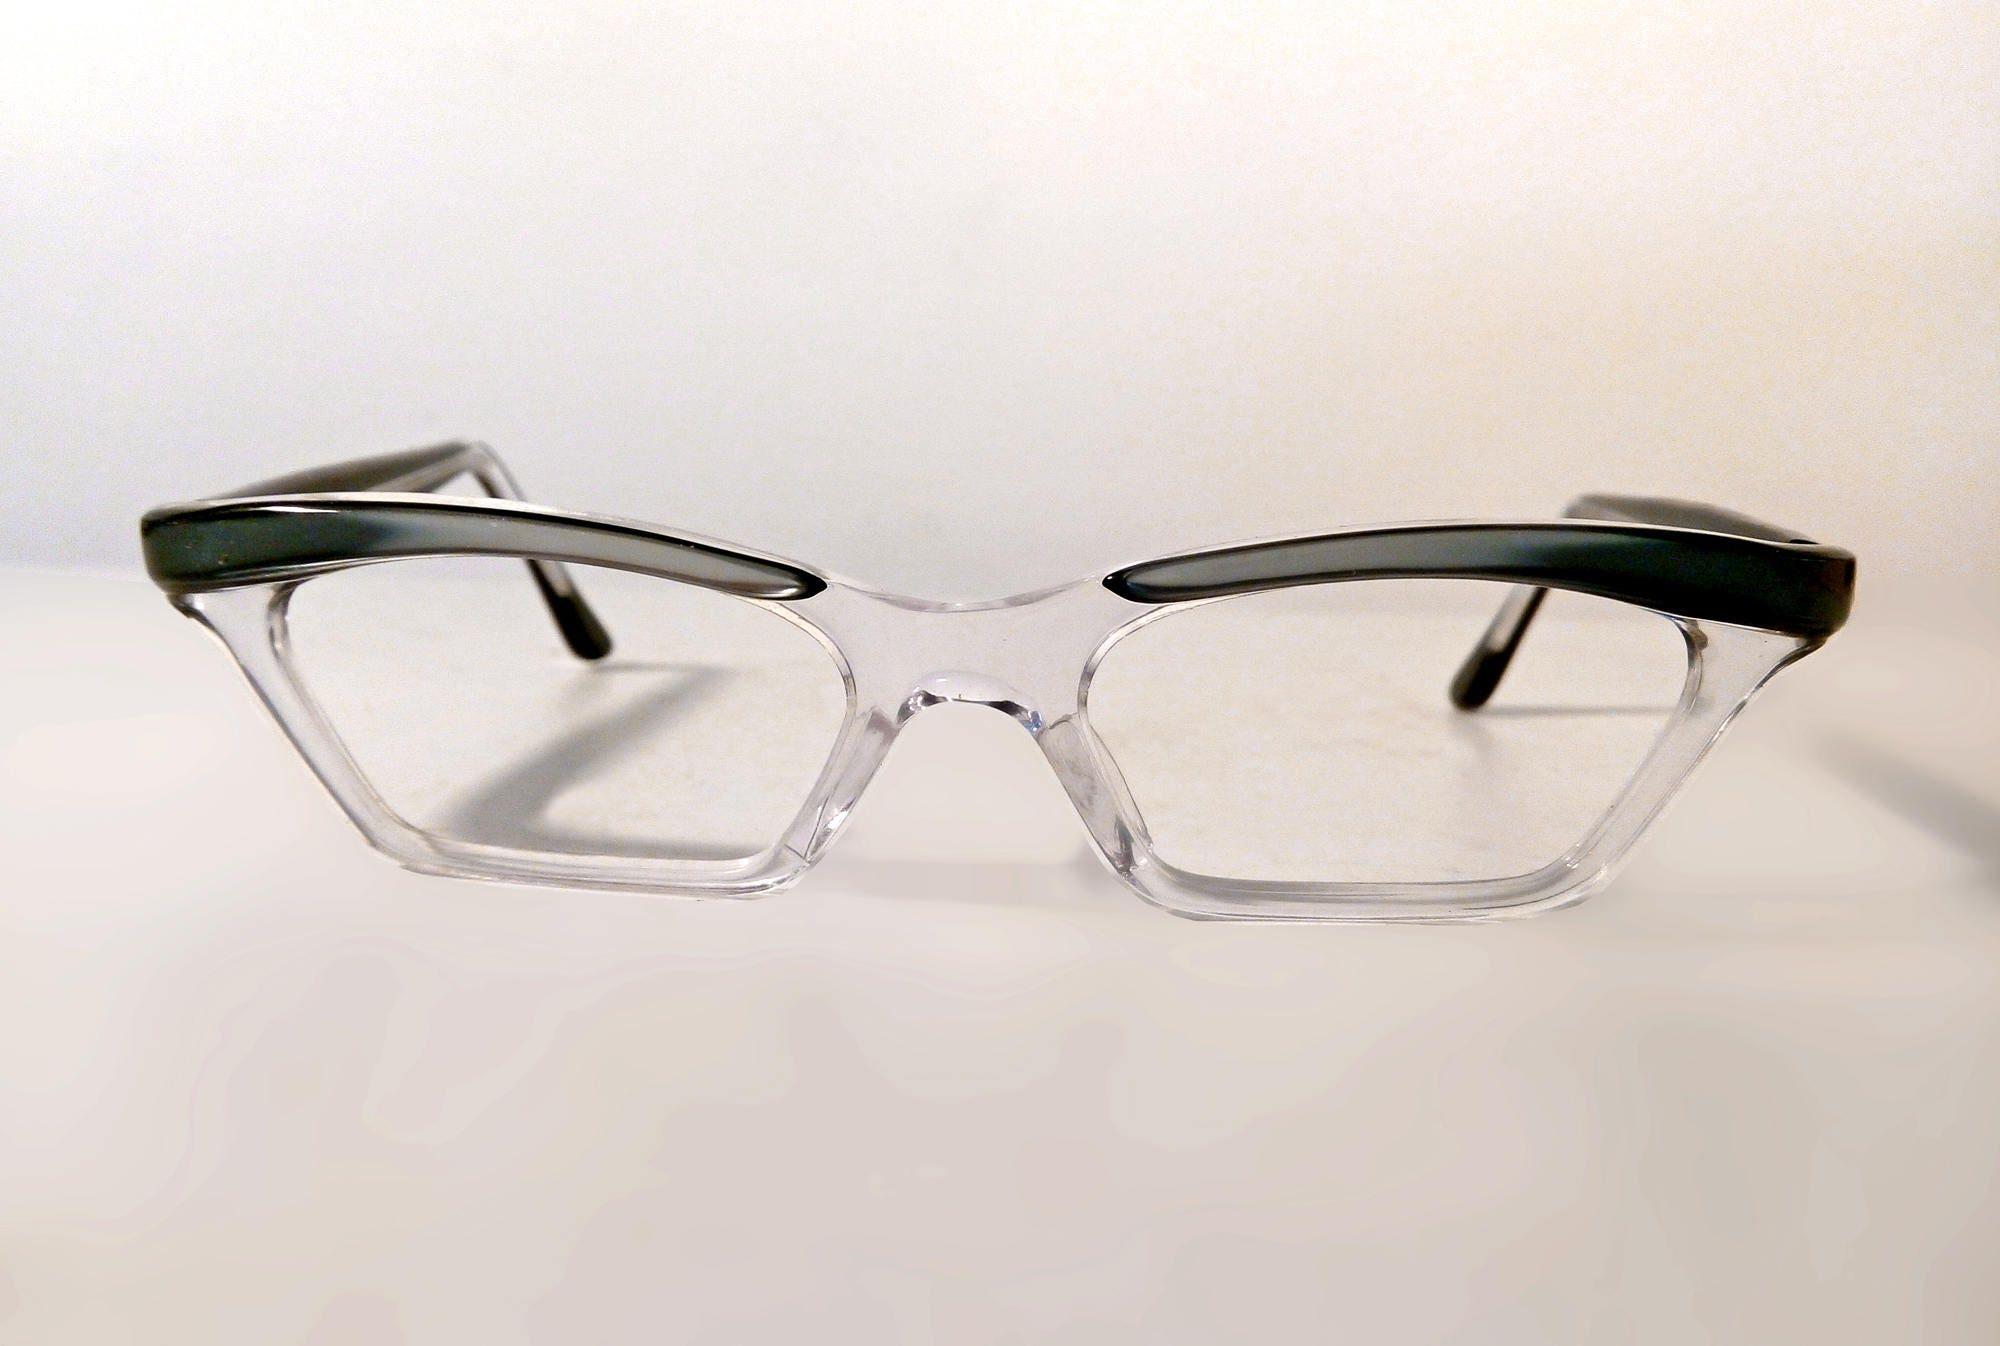 Original 1950s - 60s Wing Rimmed Glasses. Vintage Cat\'s Eye Clear ...